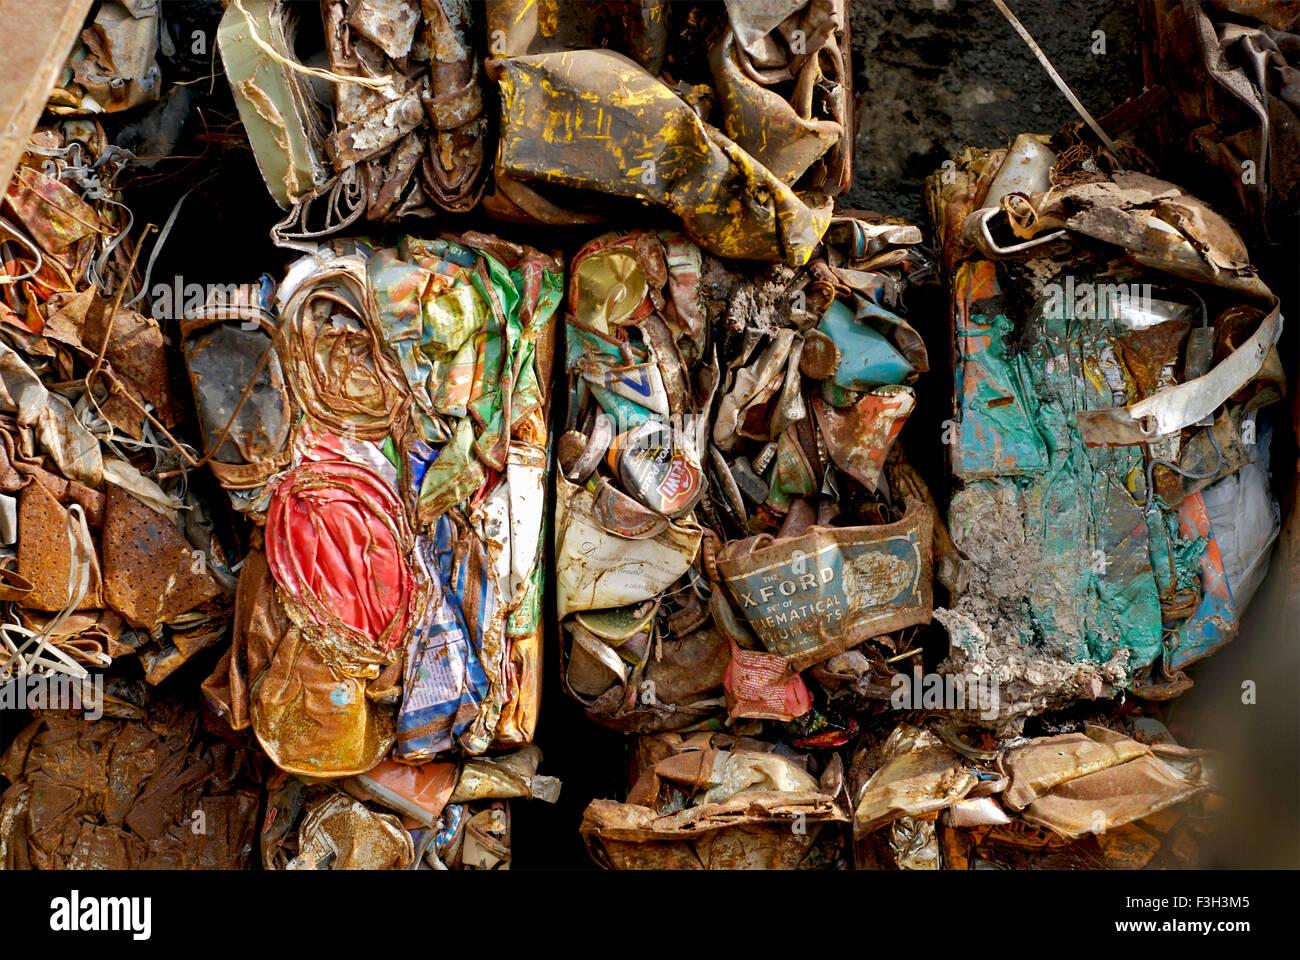 Crushed cans piled up in a scrap yard at Rajkot ; Gujarat ; India - Stock Image